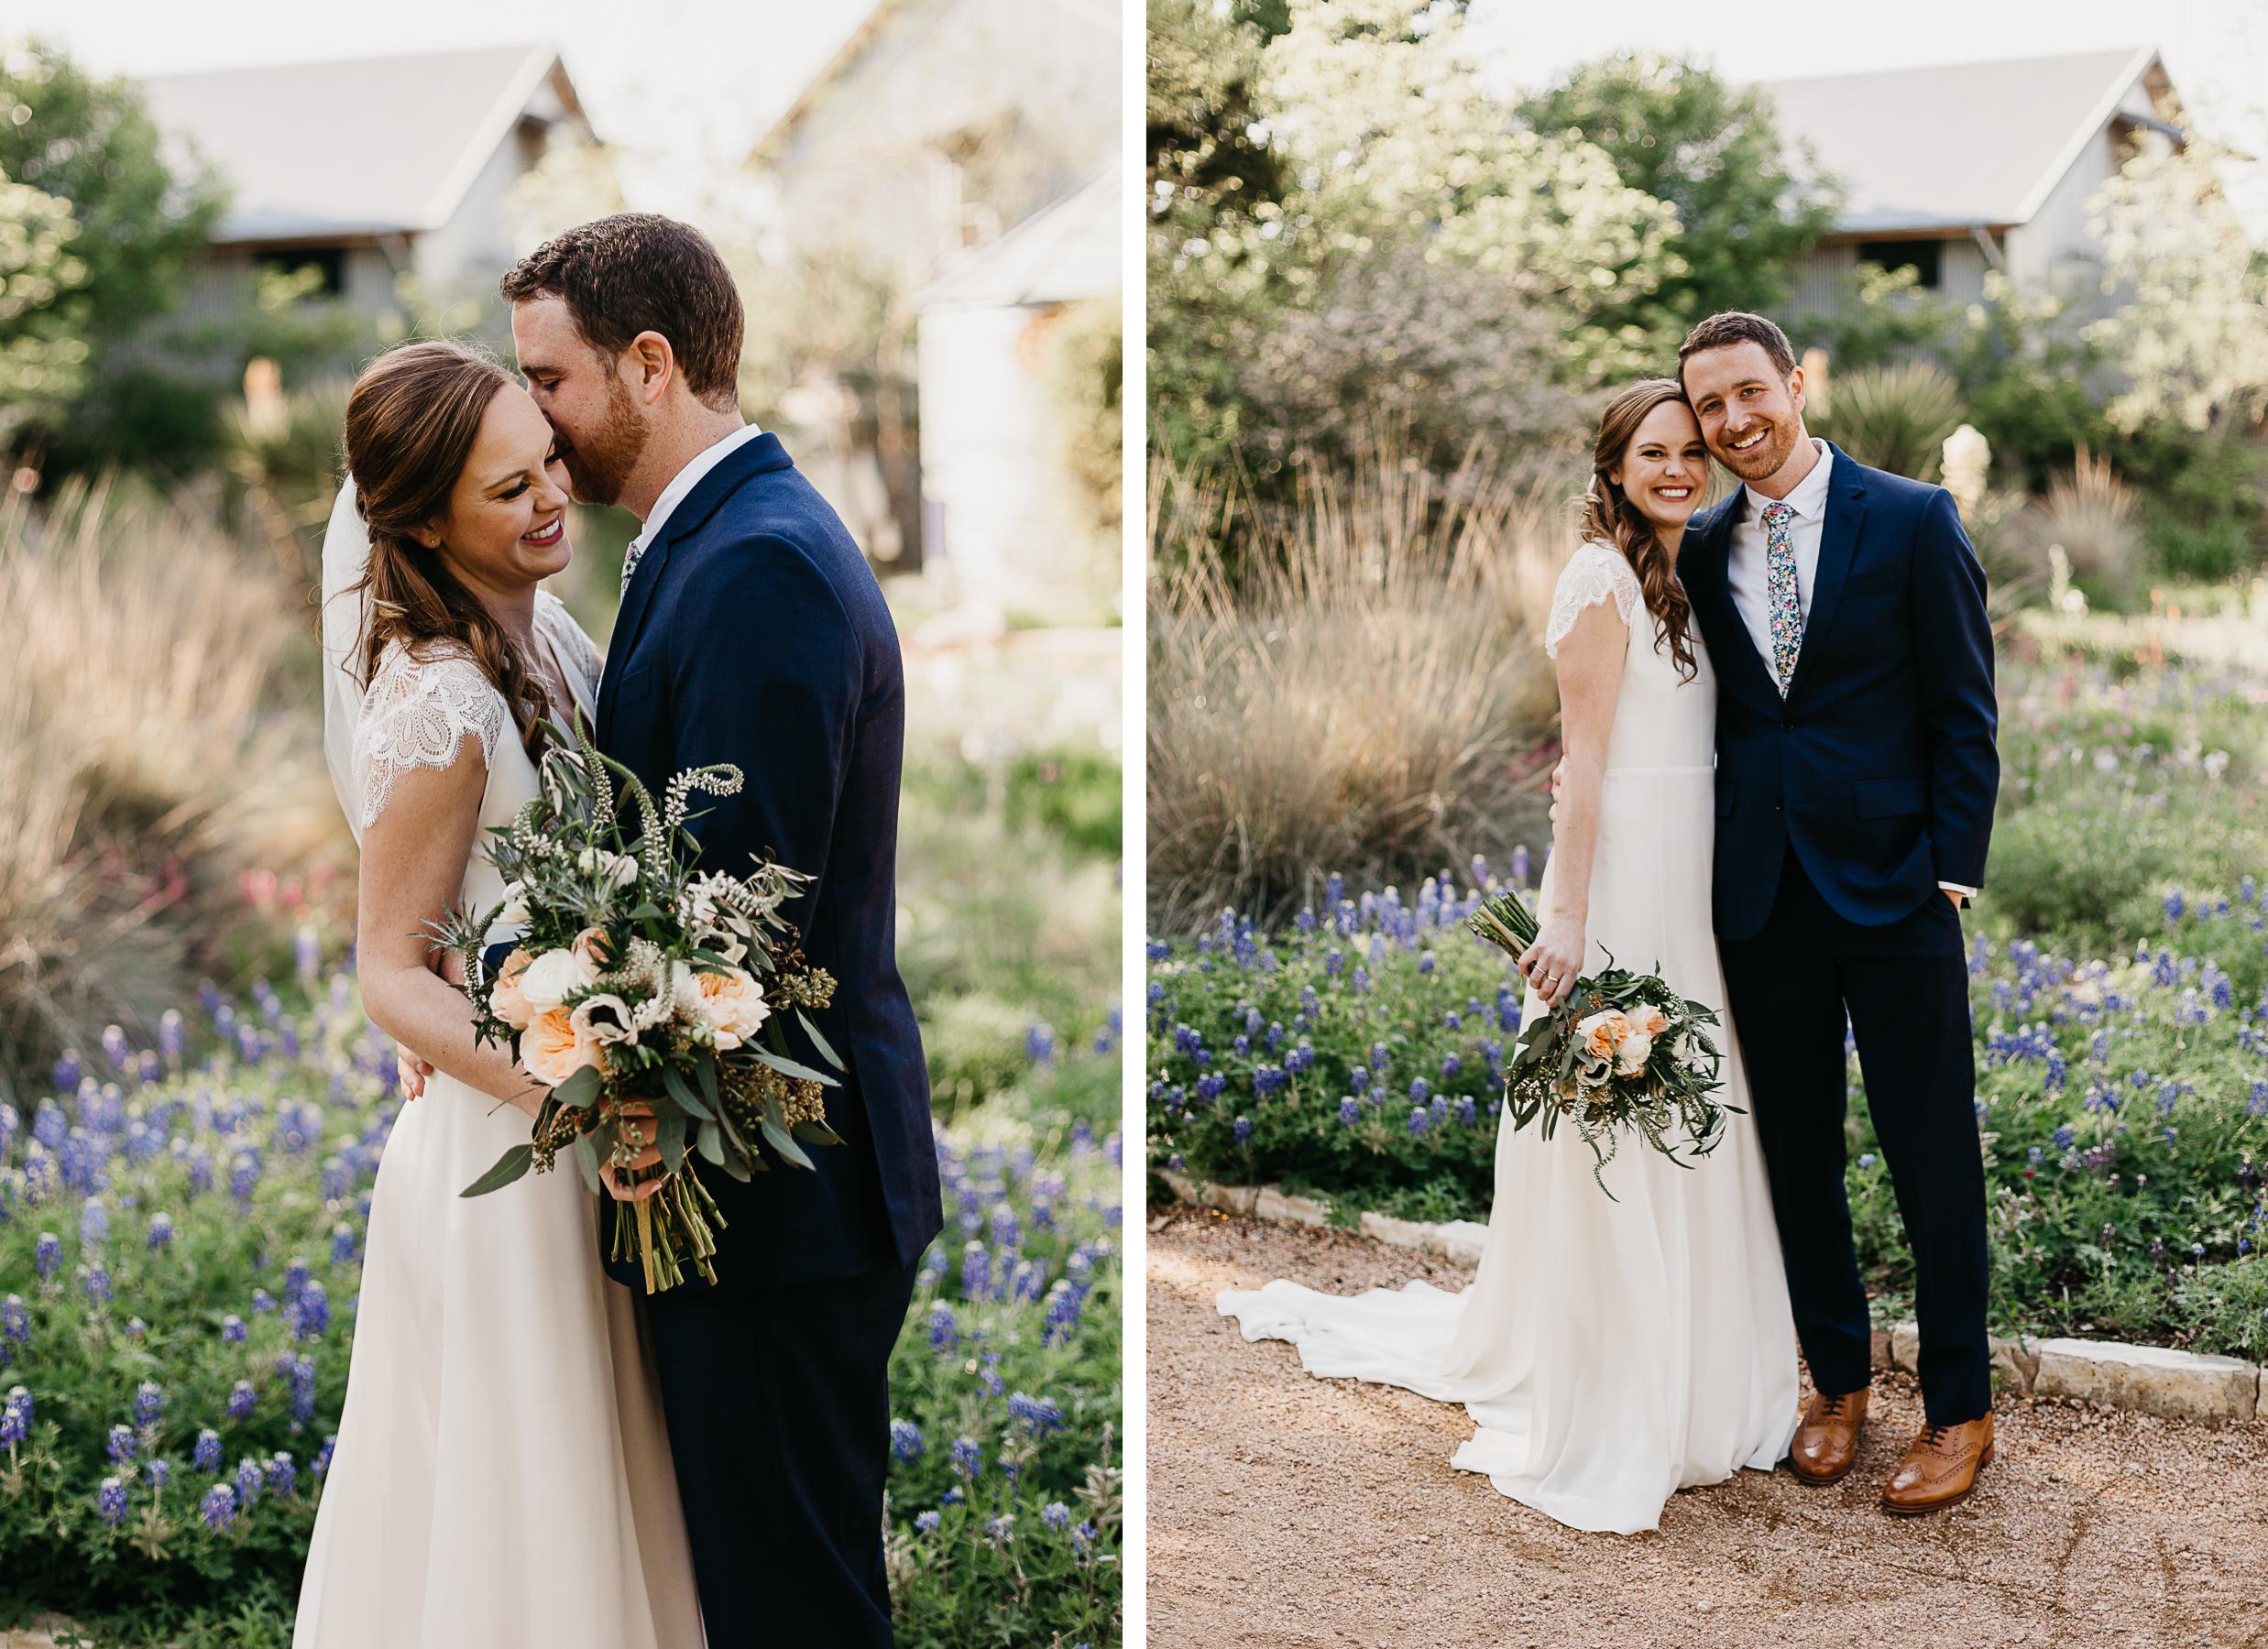 Austin Wedding Photographer Lady Bird Johnson Wildflower Center Wedding 3.jpg